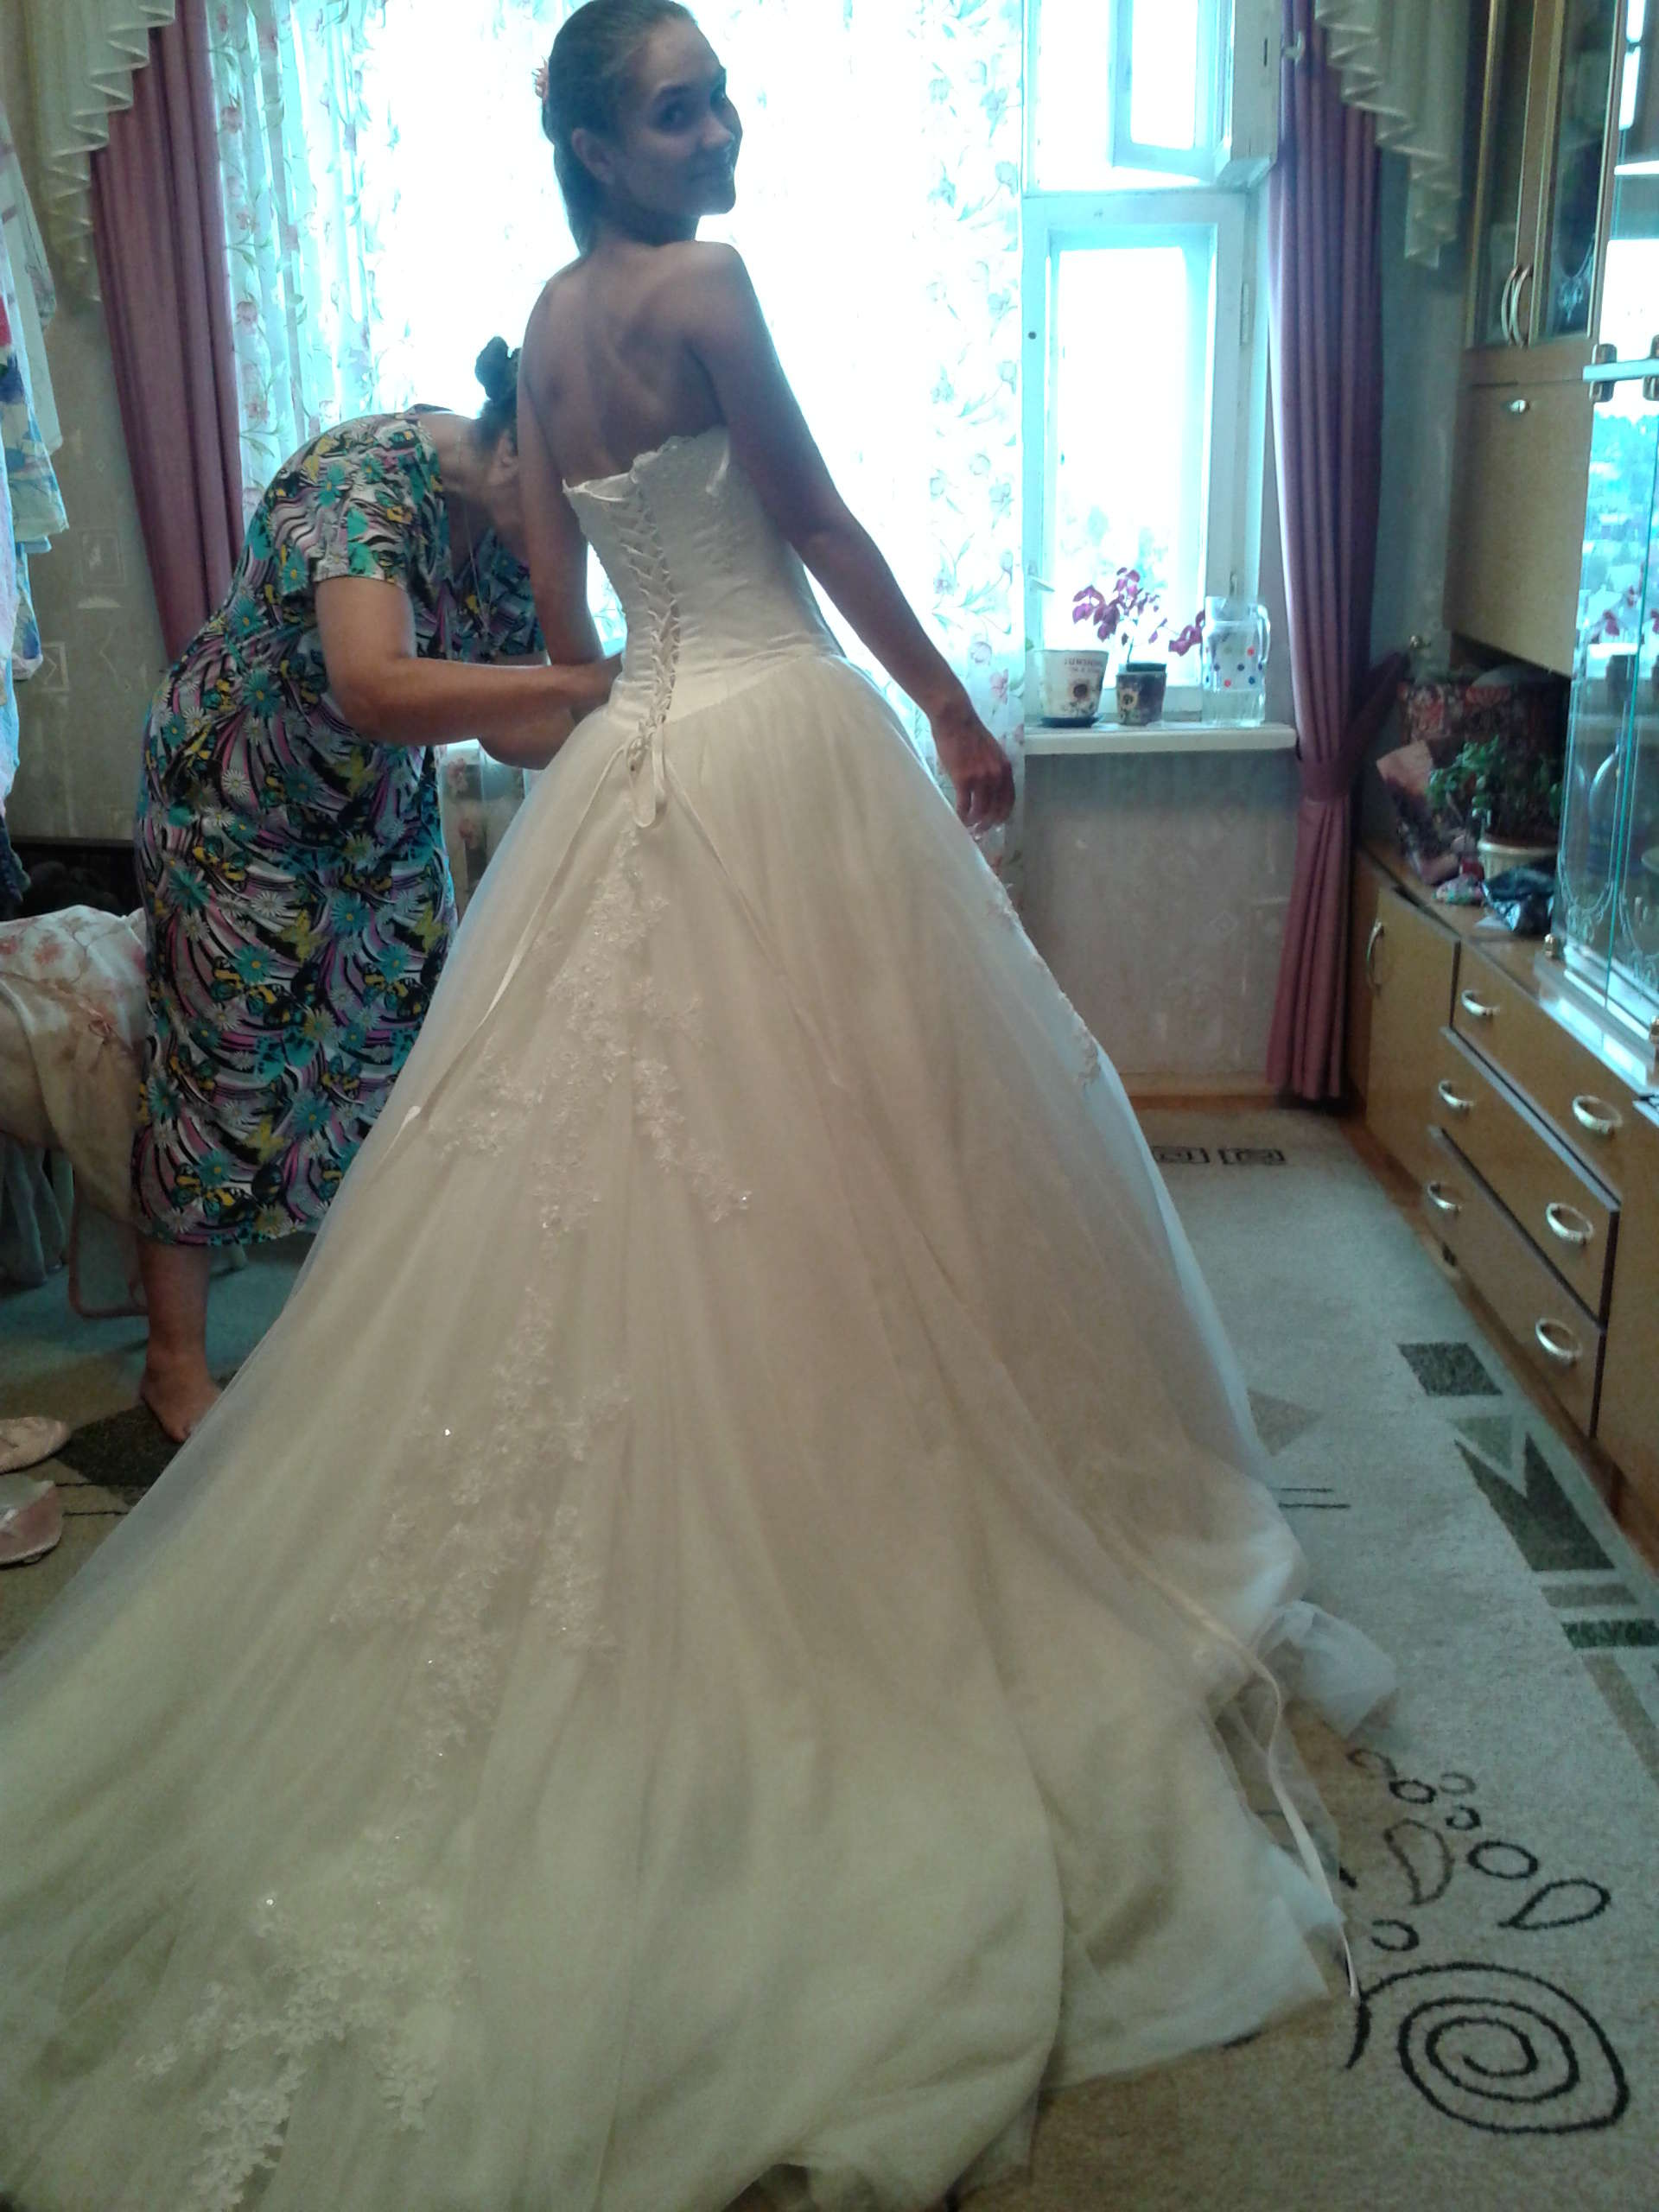 f9a89cee88f8b4c Заказ свадебного платья через интернет страница 2 - Марковские ...